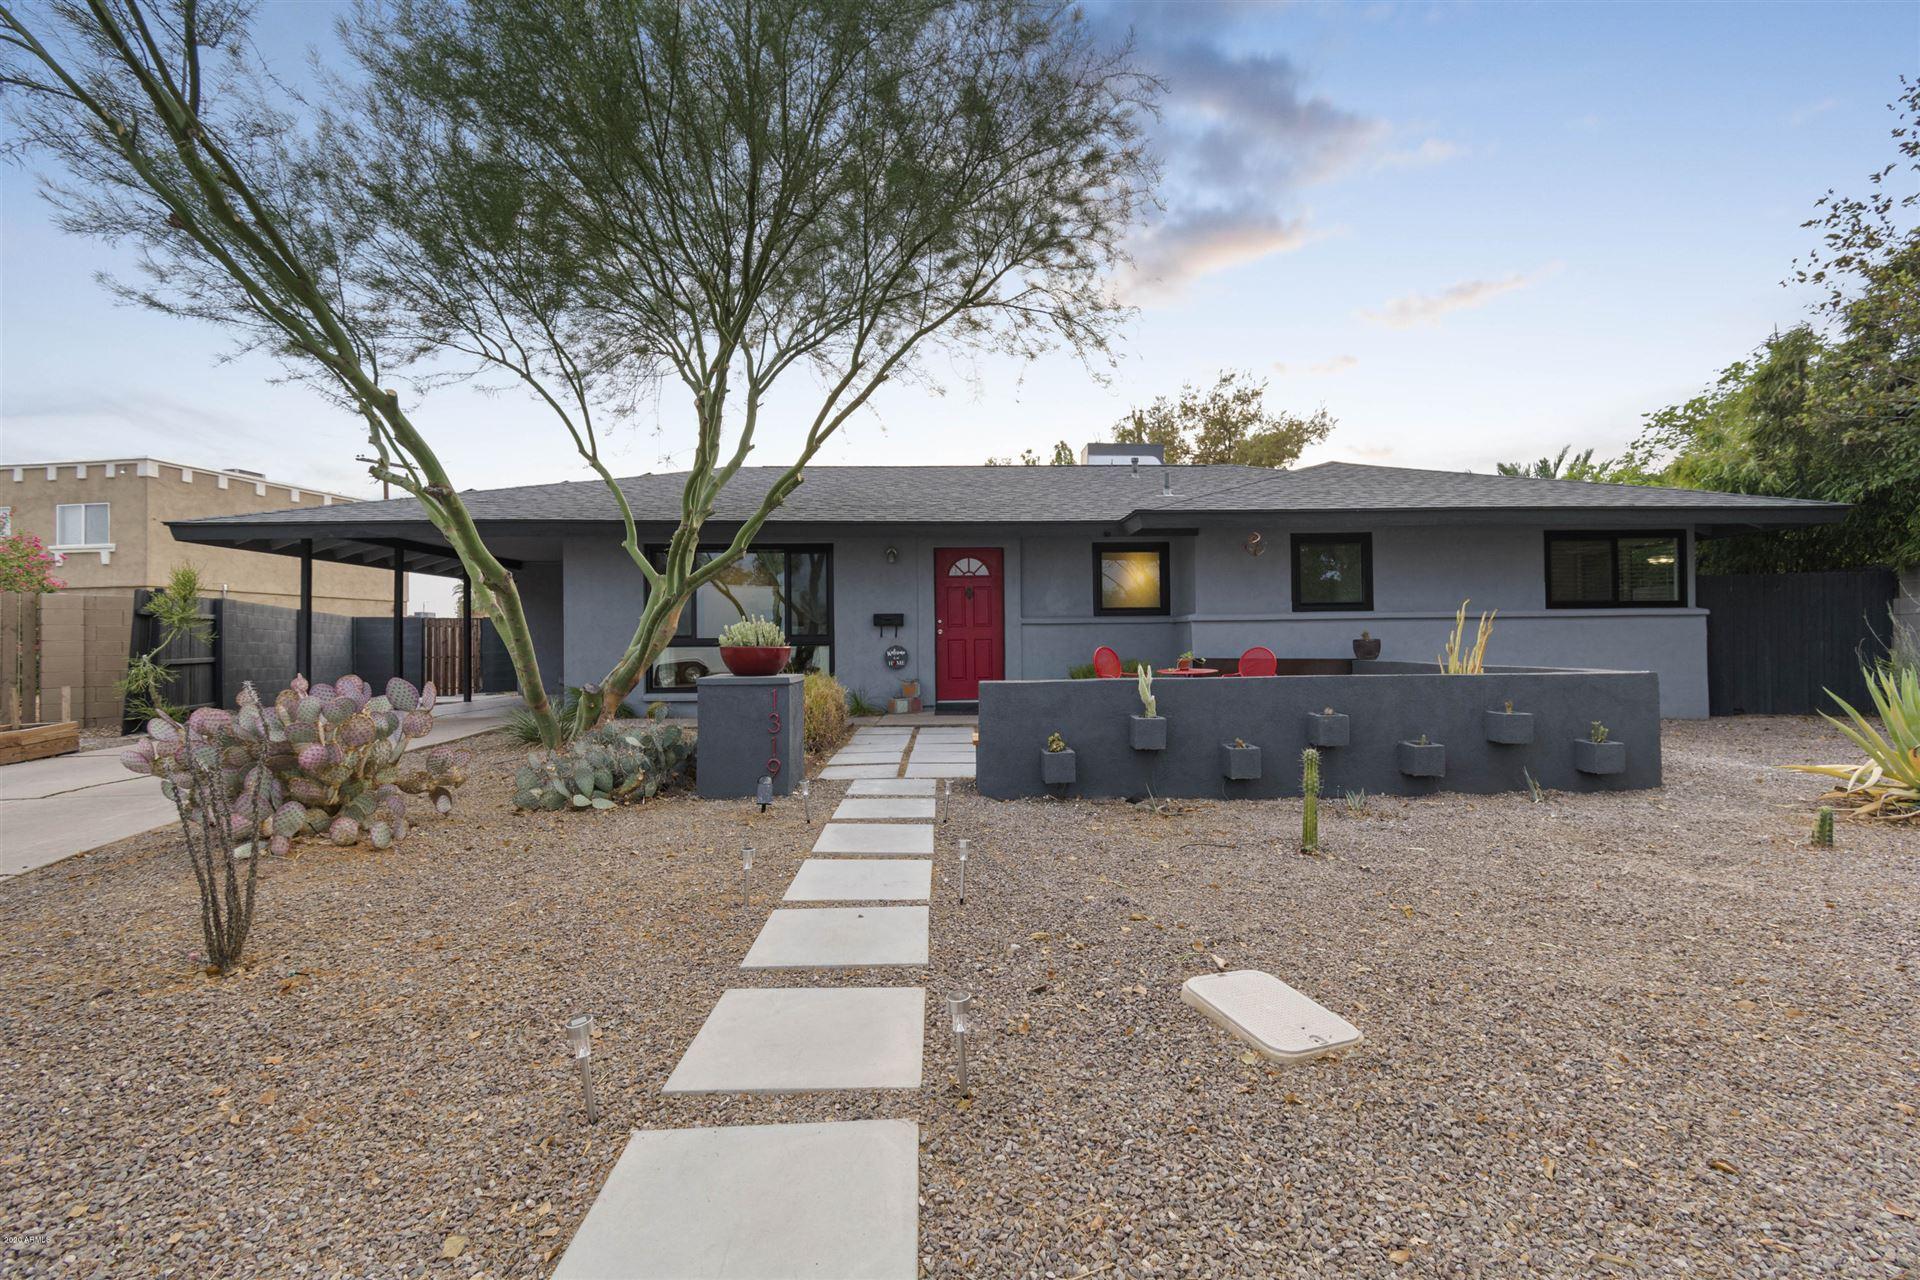 1319 W PASADENA Avenue, Phoenix, AZ 85013 - MLS#: 6123821